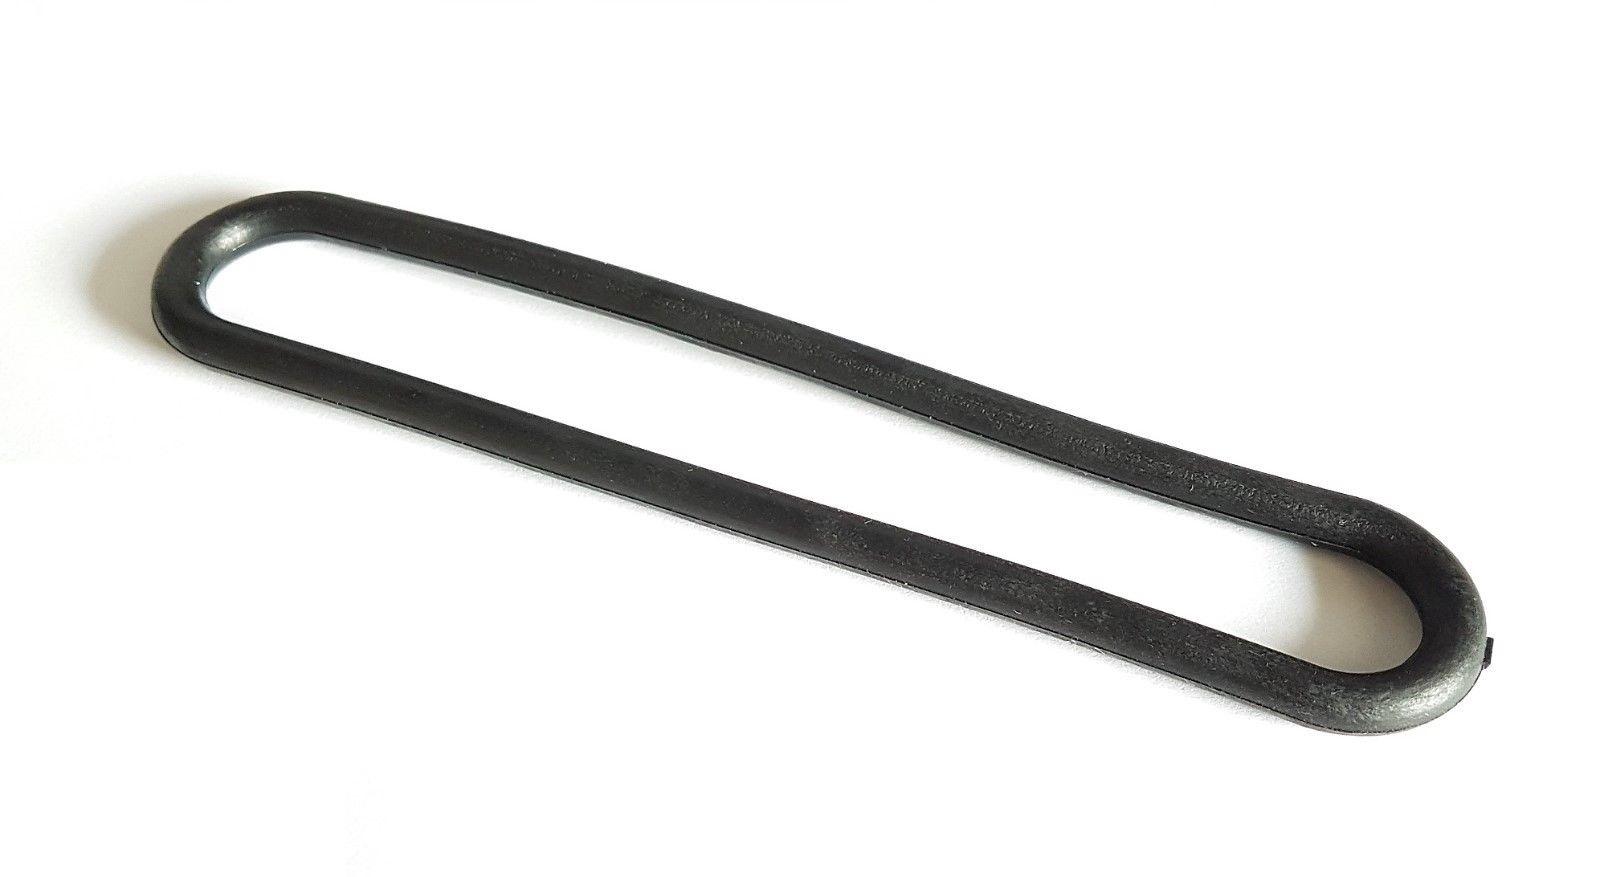 spanrubbers zwart 25 cm 8 mm dik